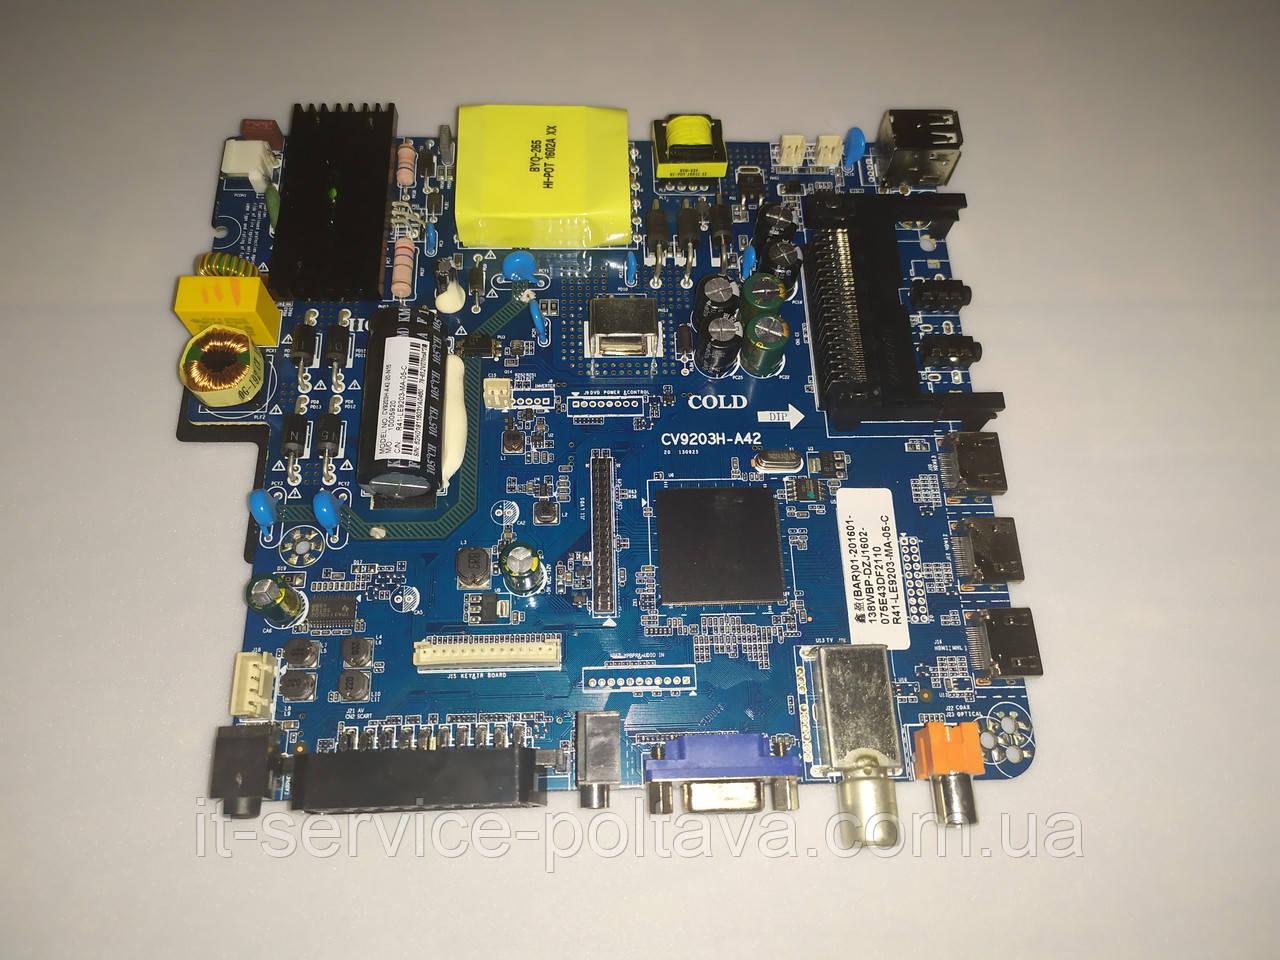 Материнська плата (Main Board) CV9203H-A42 для телевізора AKAI